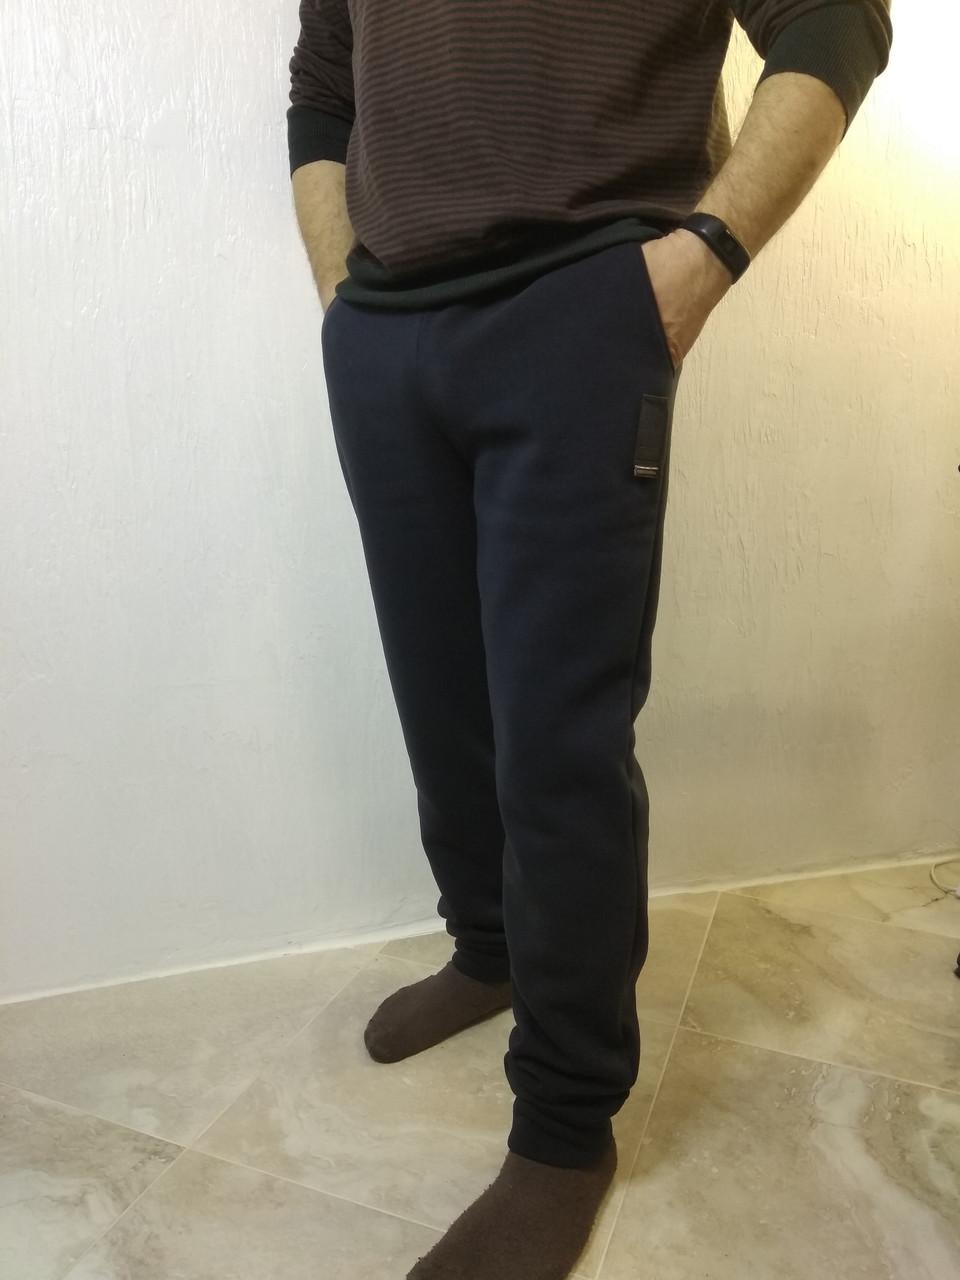 Спортивные штаны на манжетах мужские 48 размер